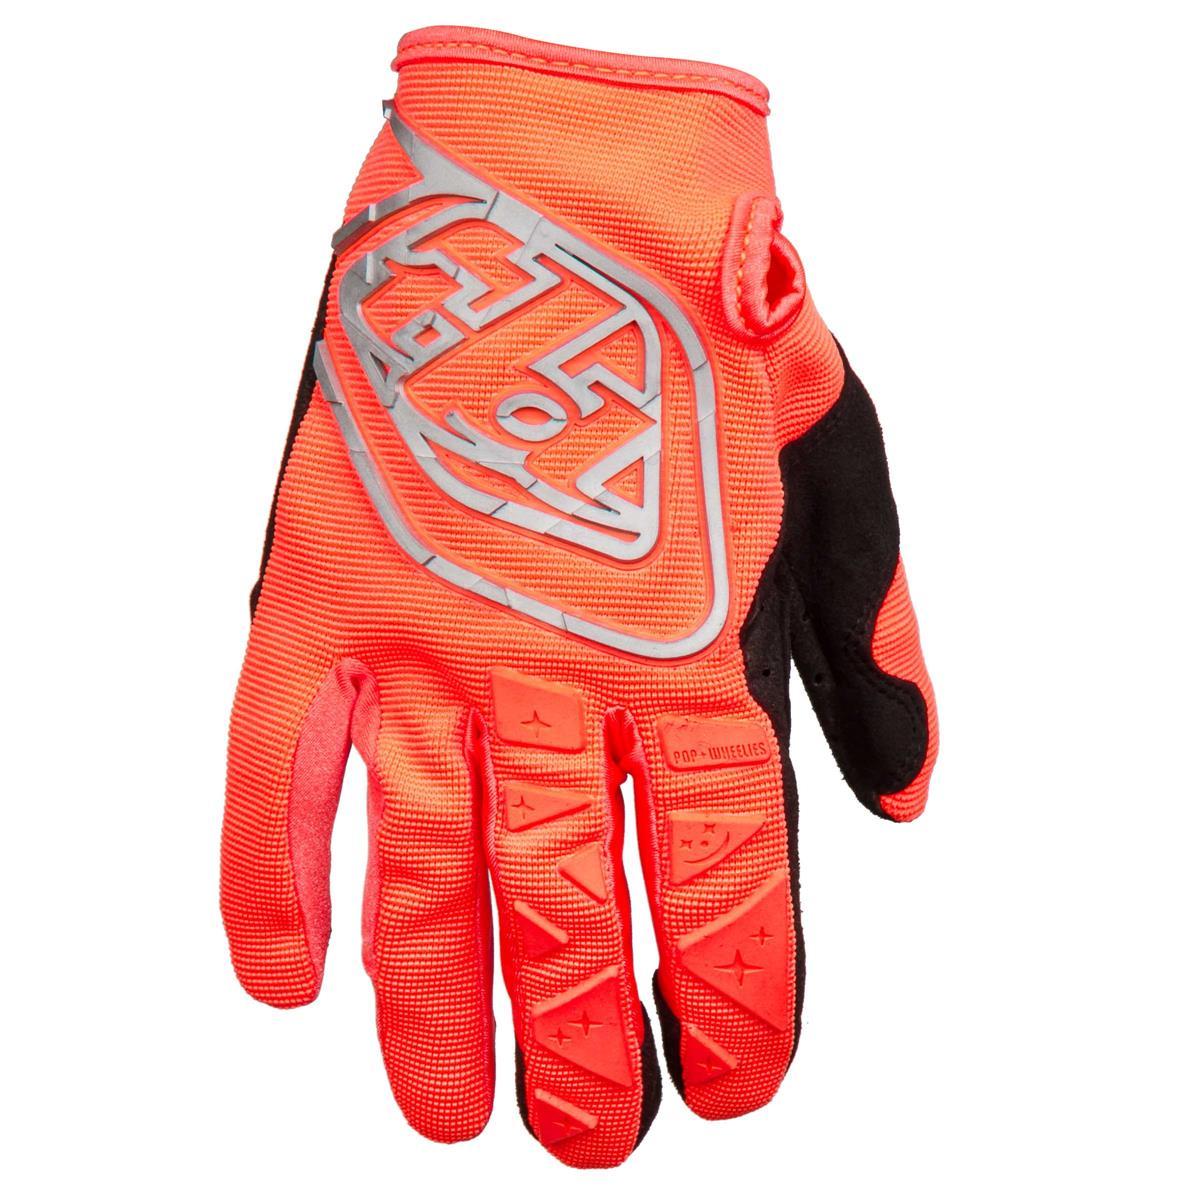 Troy Lee Designs Handschuhe Adventure Light Orange